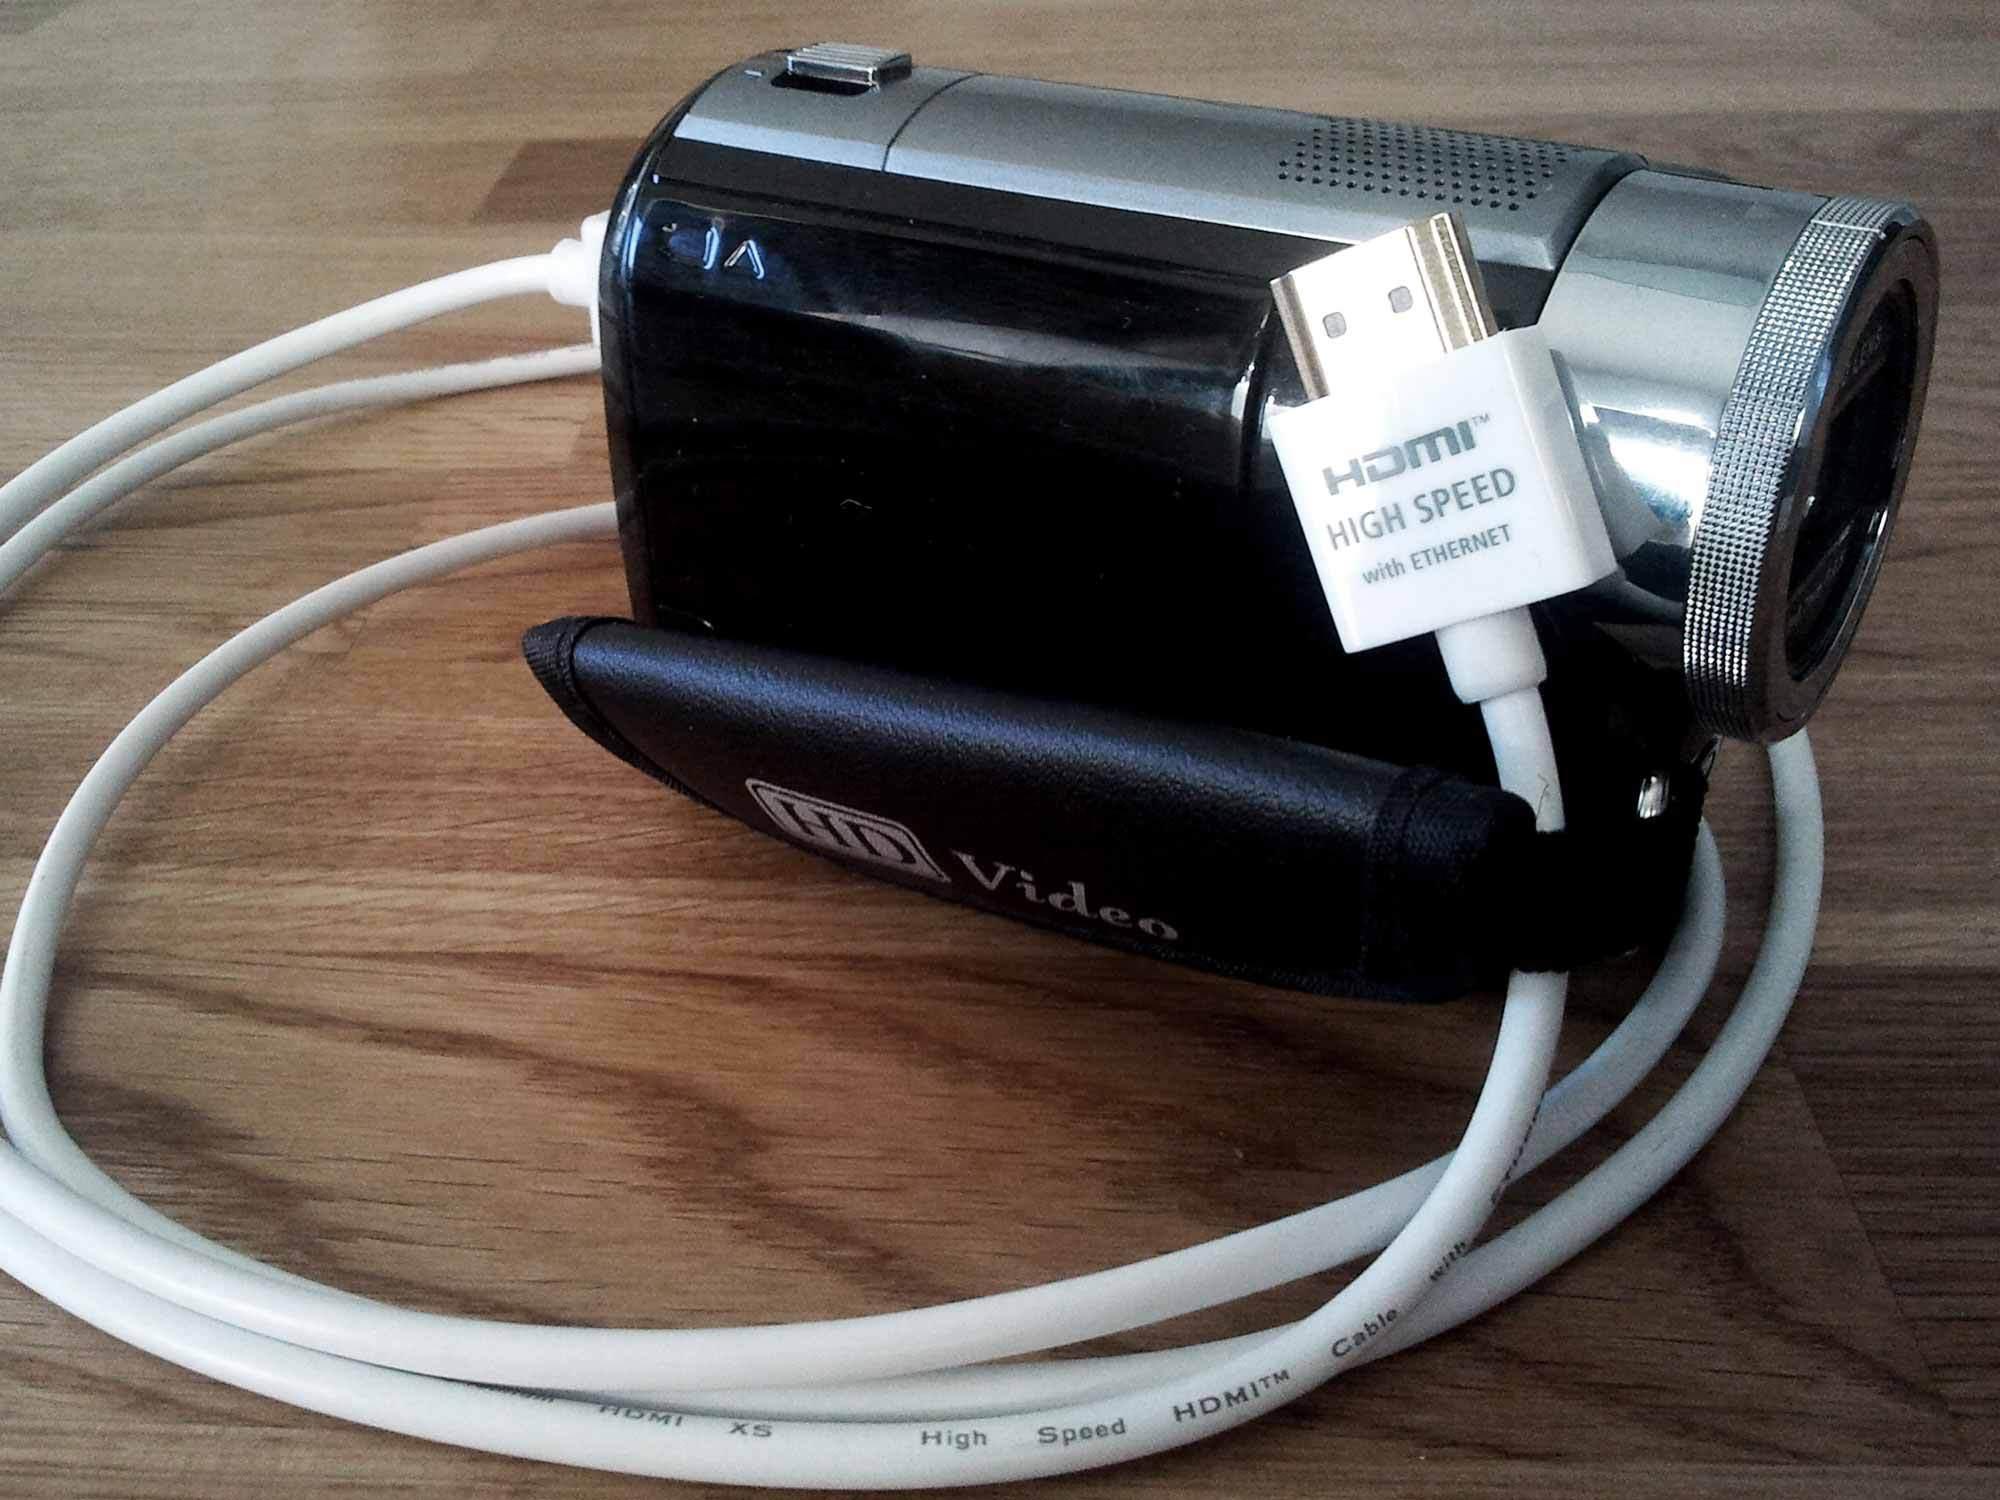 Inakustik Premium HDMI XS